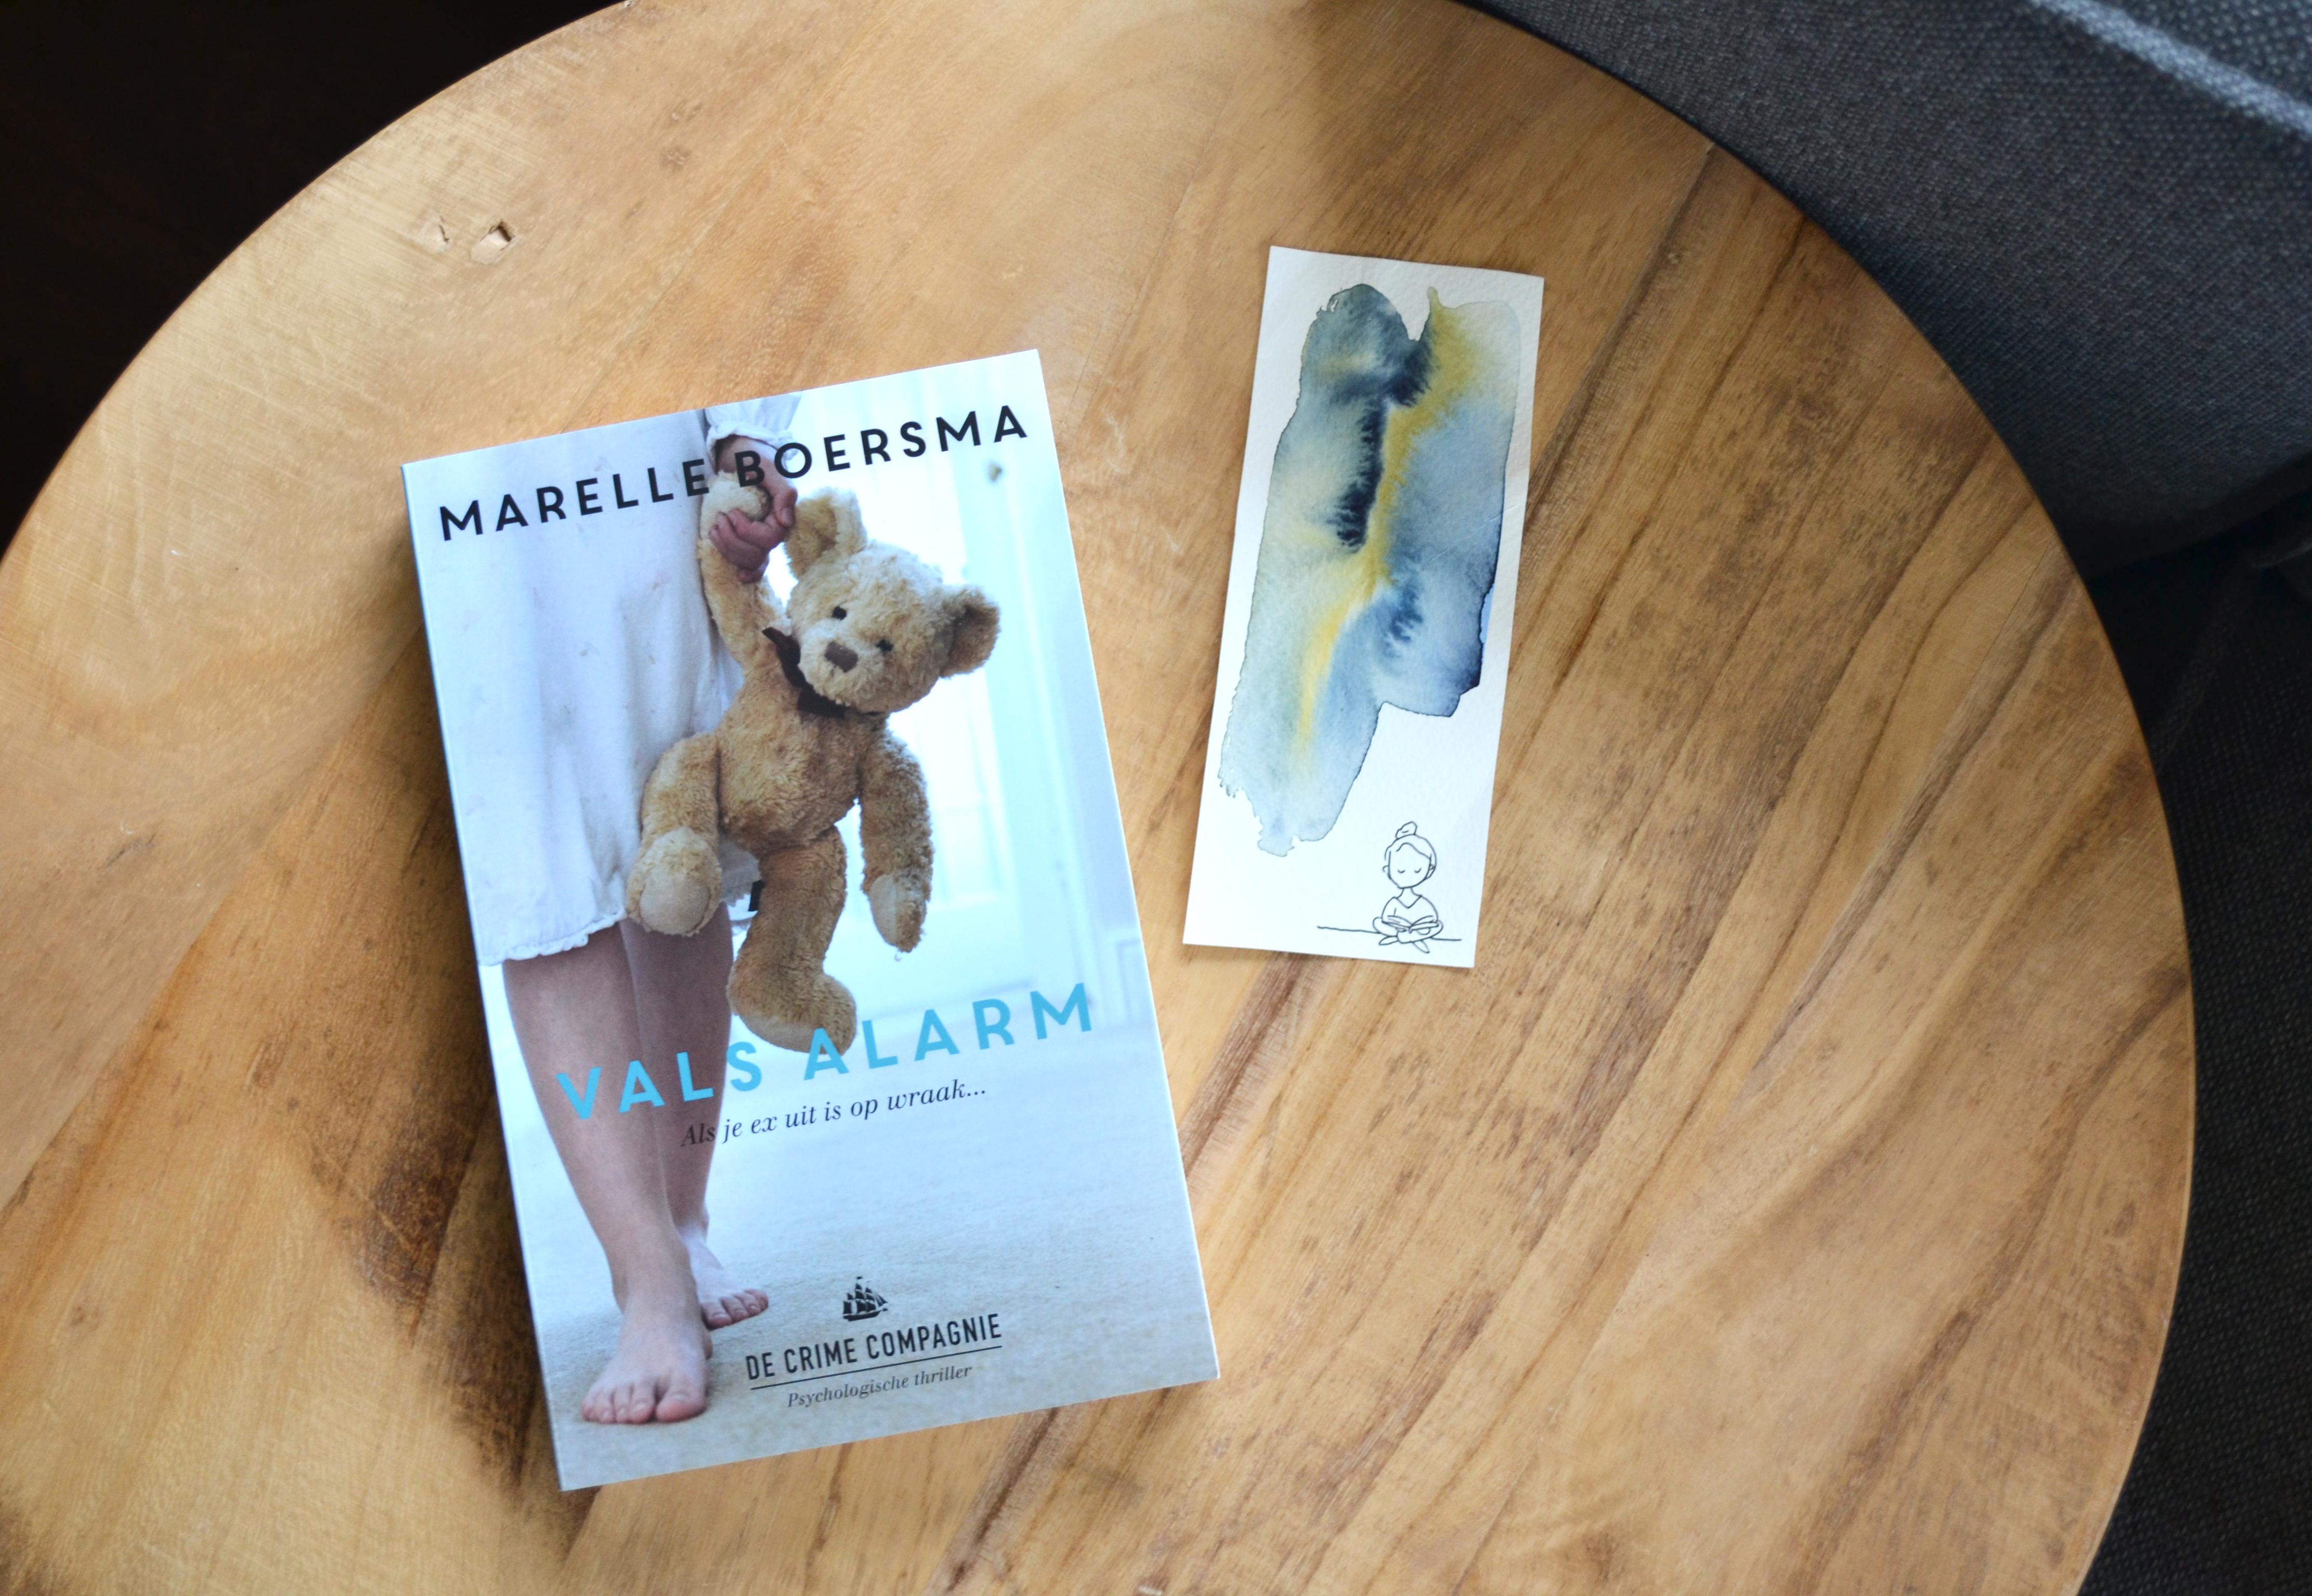 Marelle Boersma - Vals Alarm